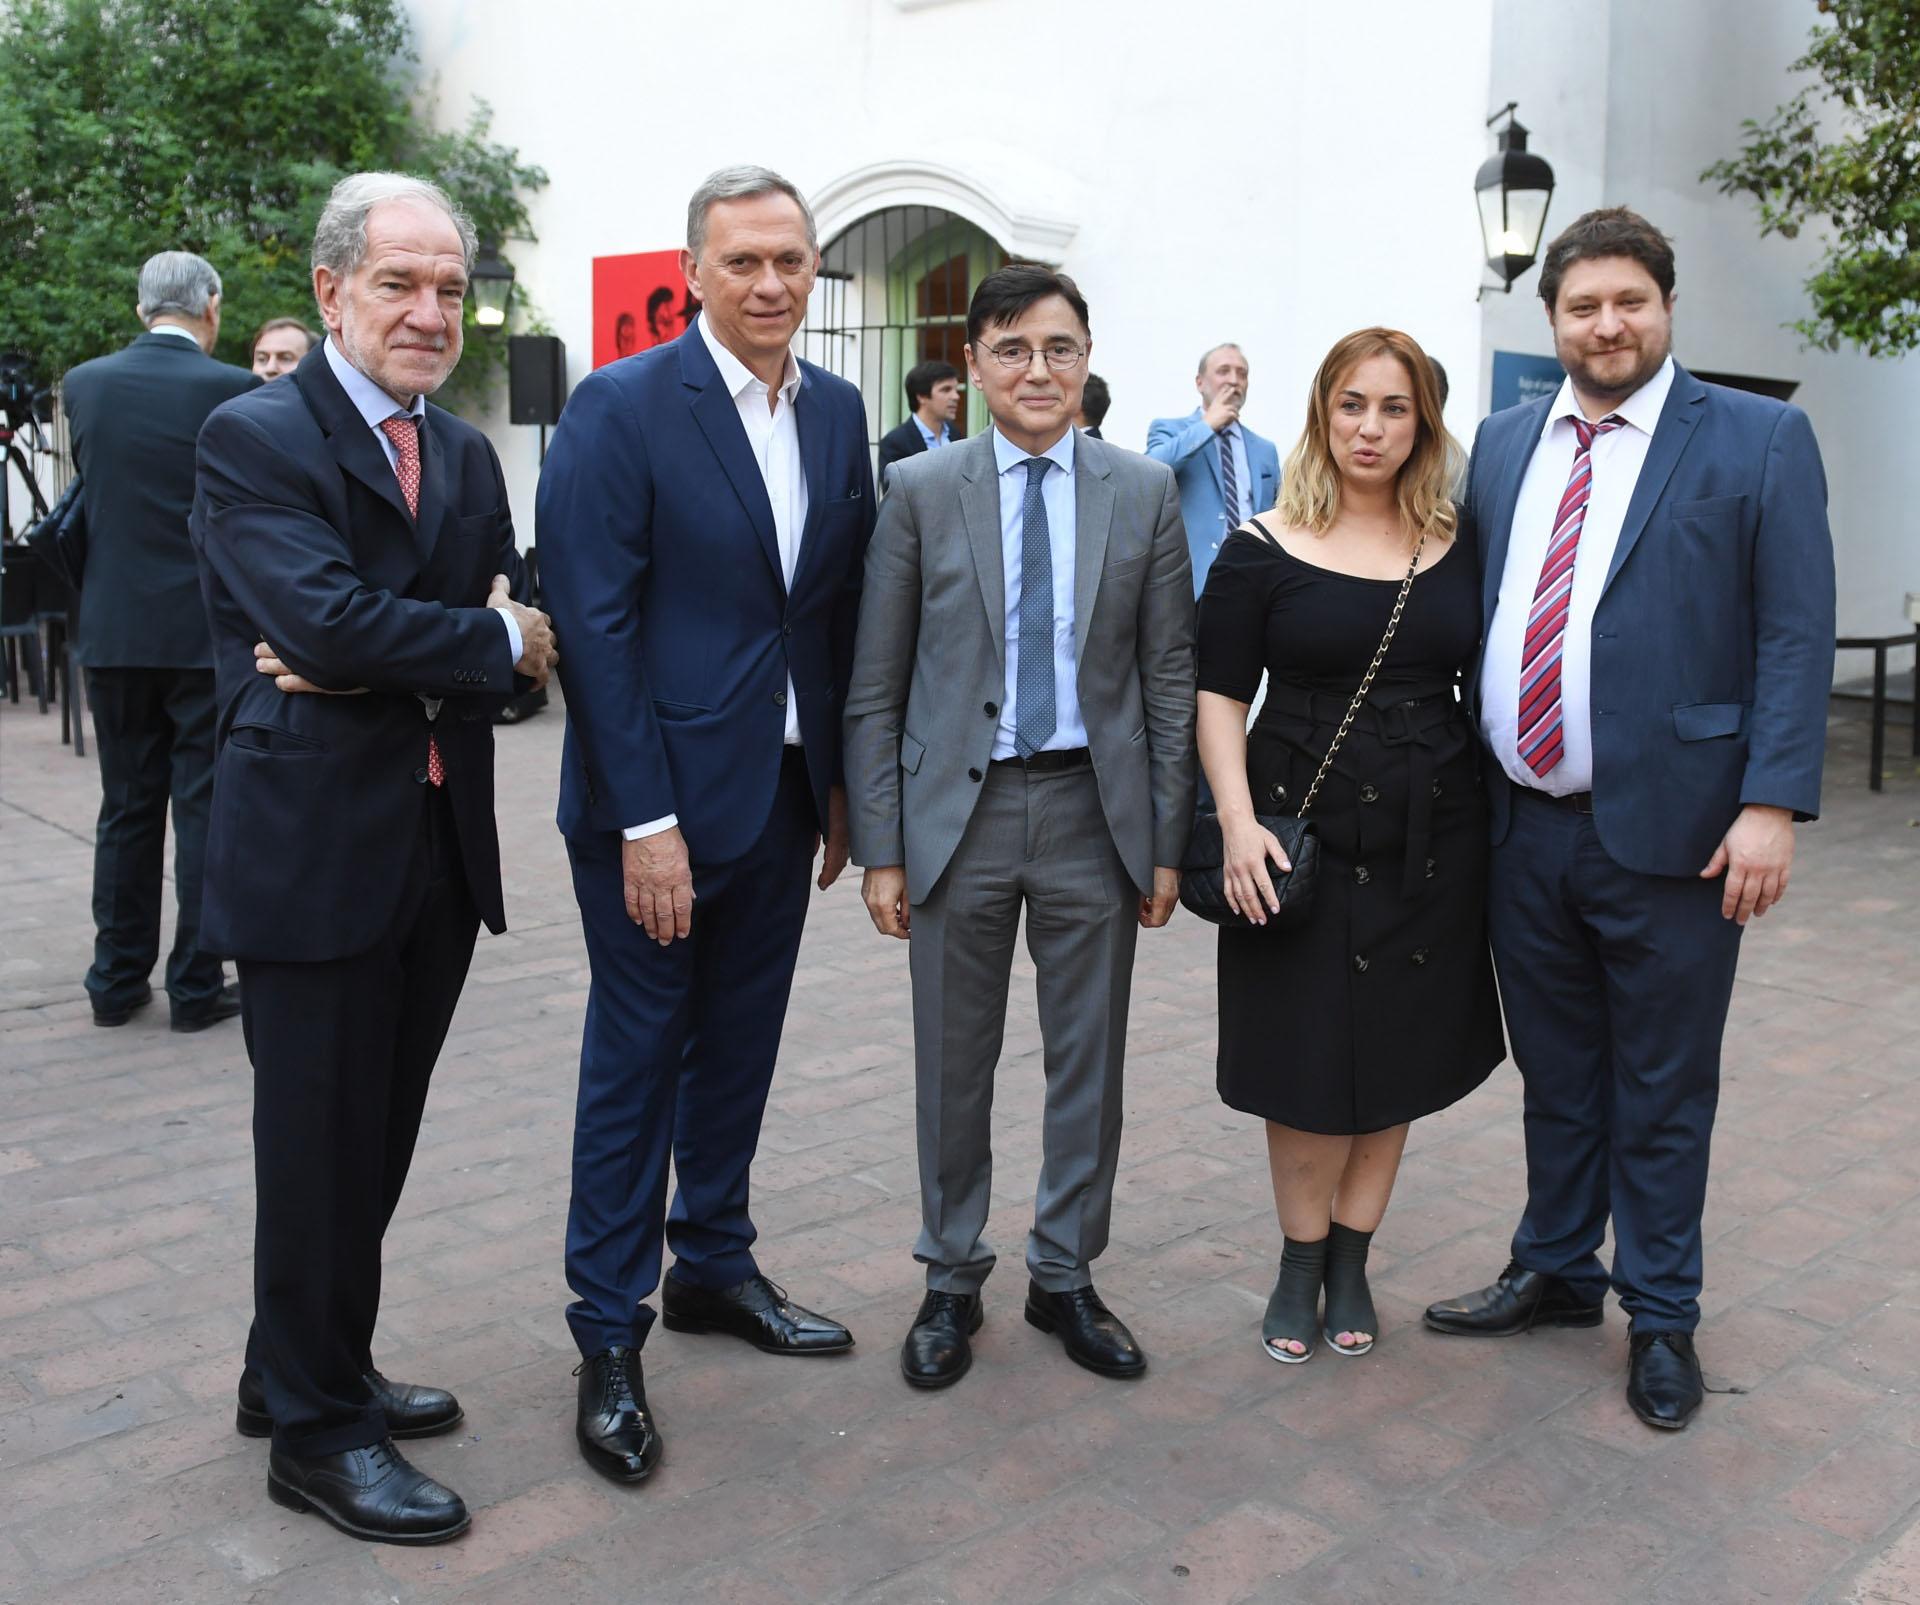 Héctor D'Amico, Marcelo Bonelli, Jorge Fontevecchia, María Julia Oliván y Nicolás Wiñazki